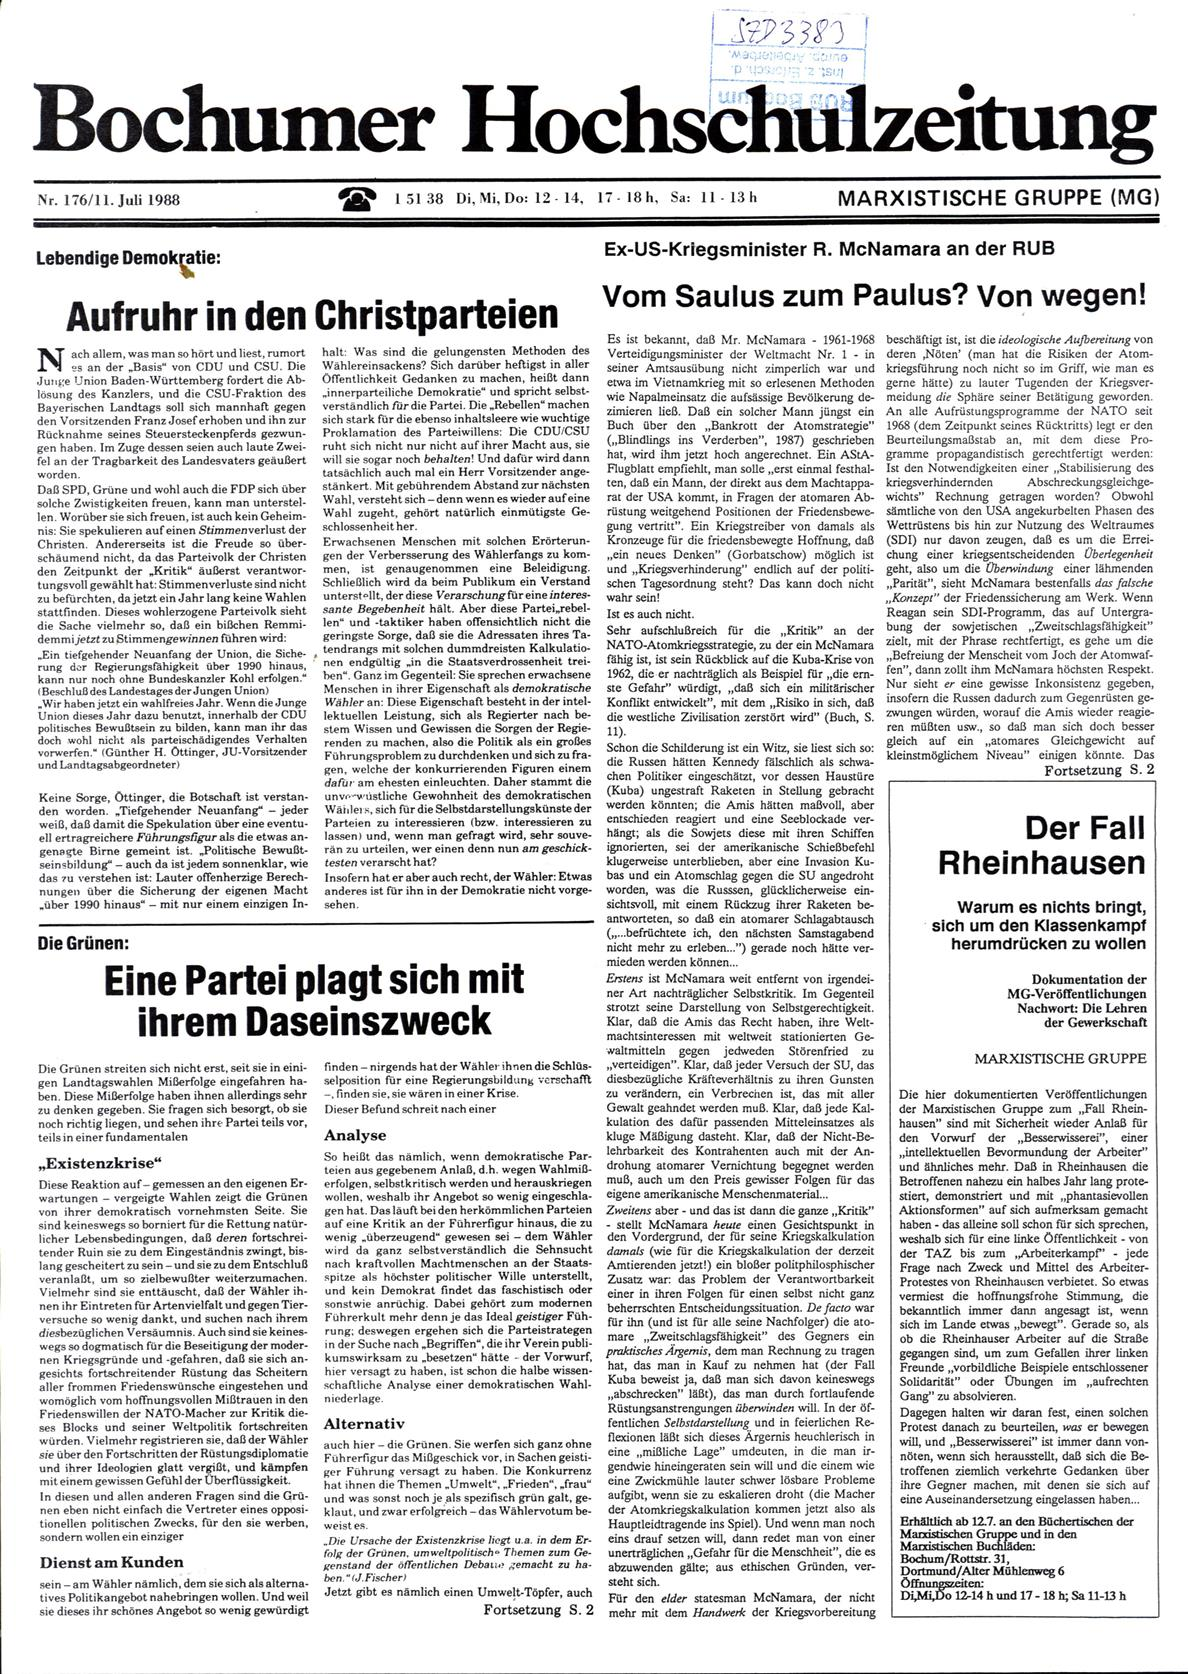 Bochum_BHZ_19880711_176_001